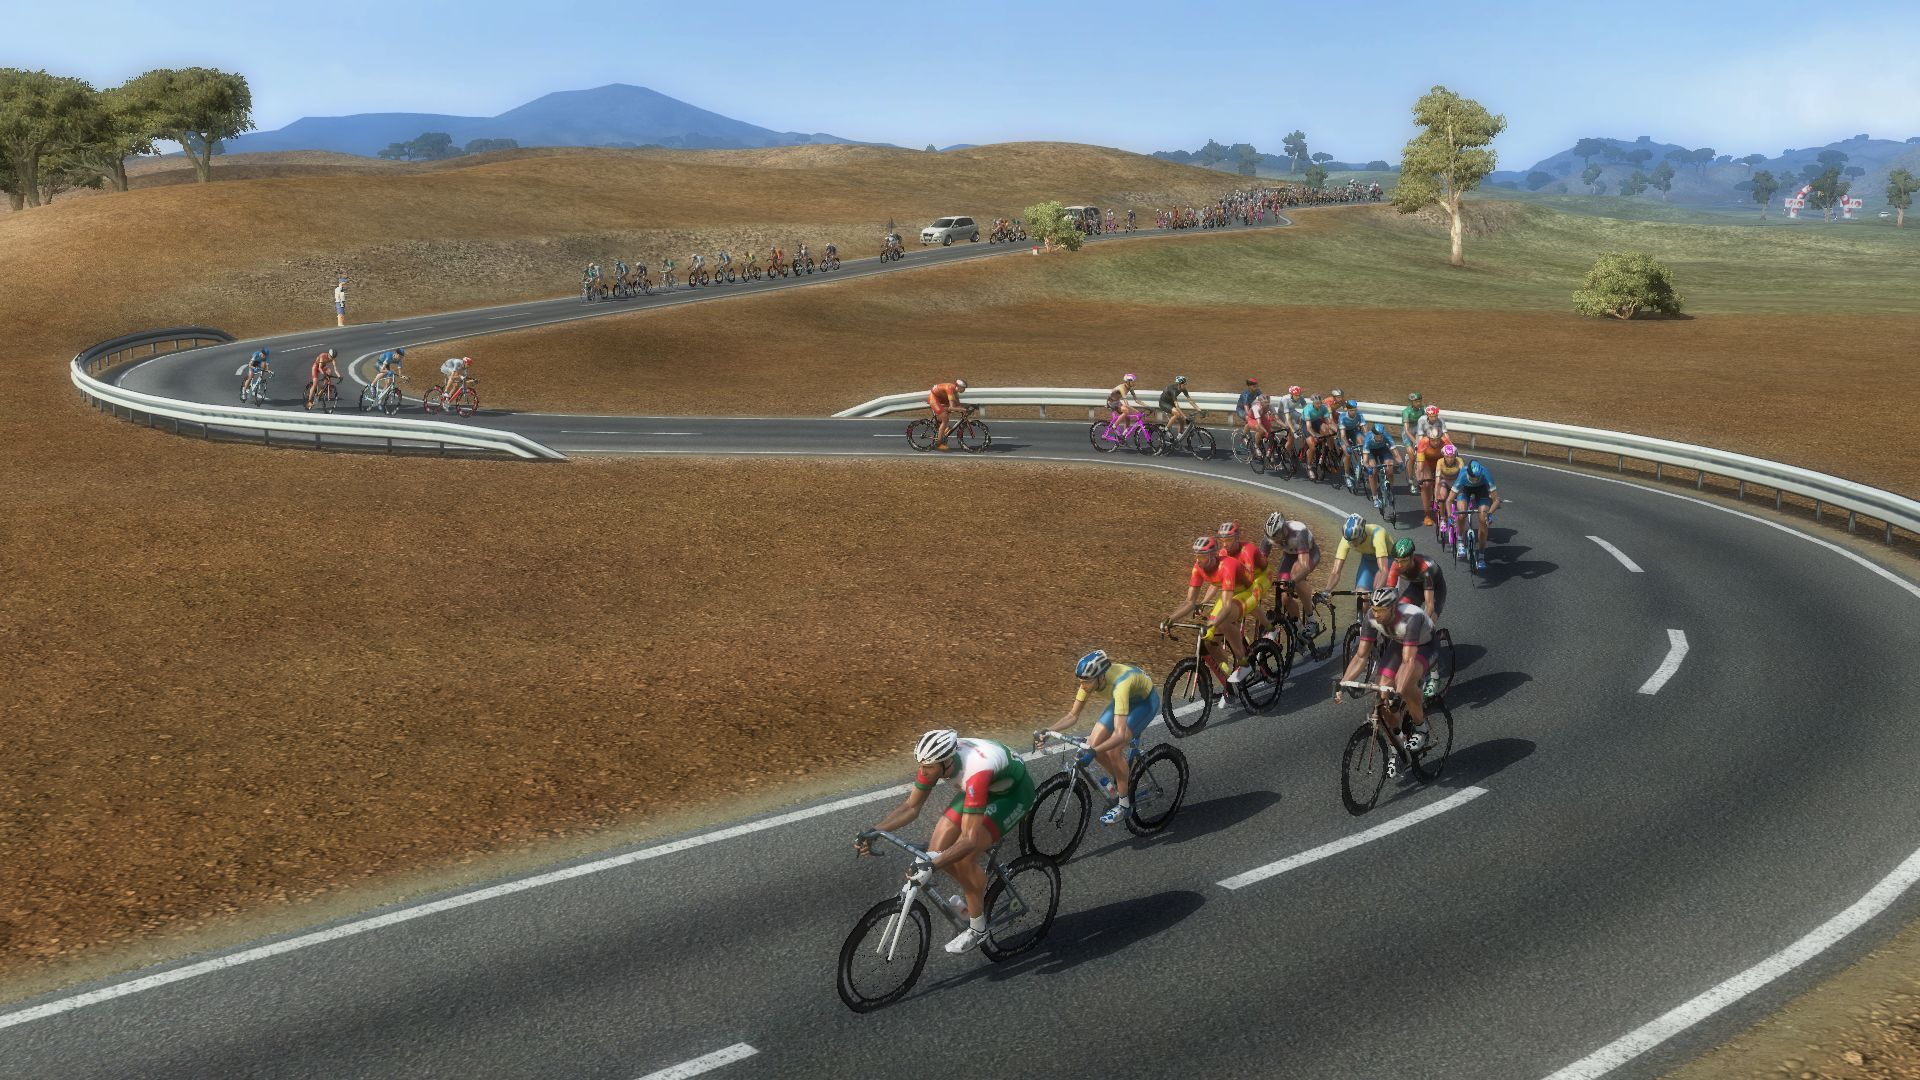 pcmdaily.com/images/mg/2019/Races/PTHC/East%20Java/JavaS1%205.jpg